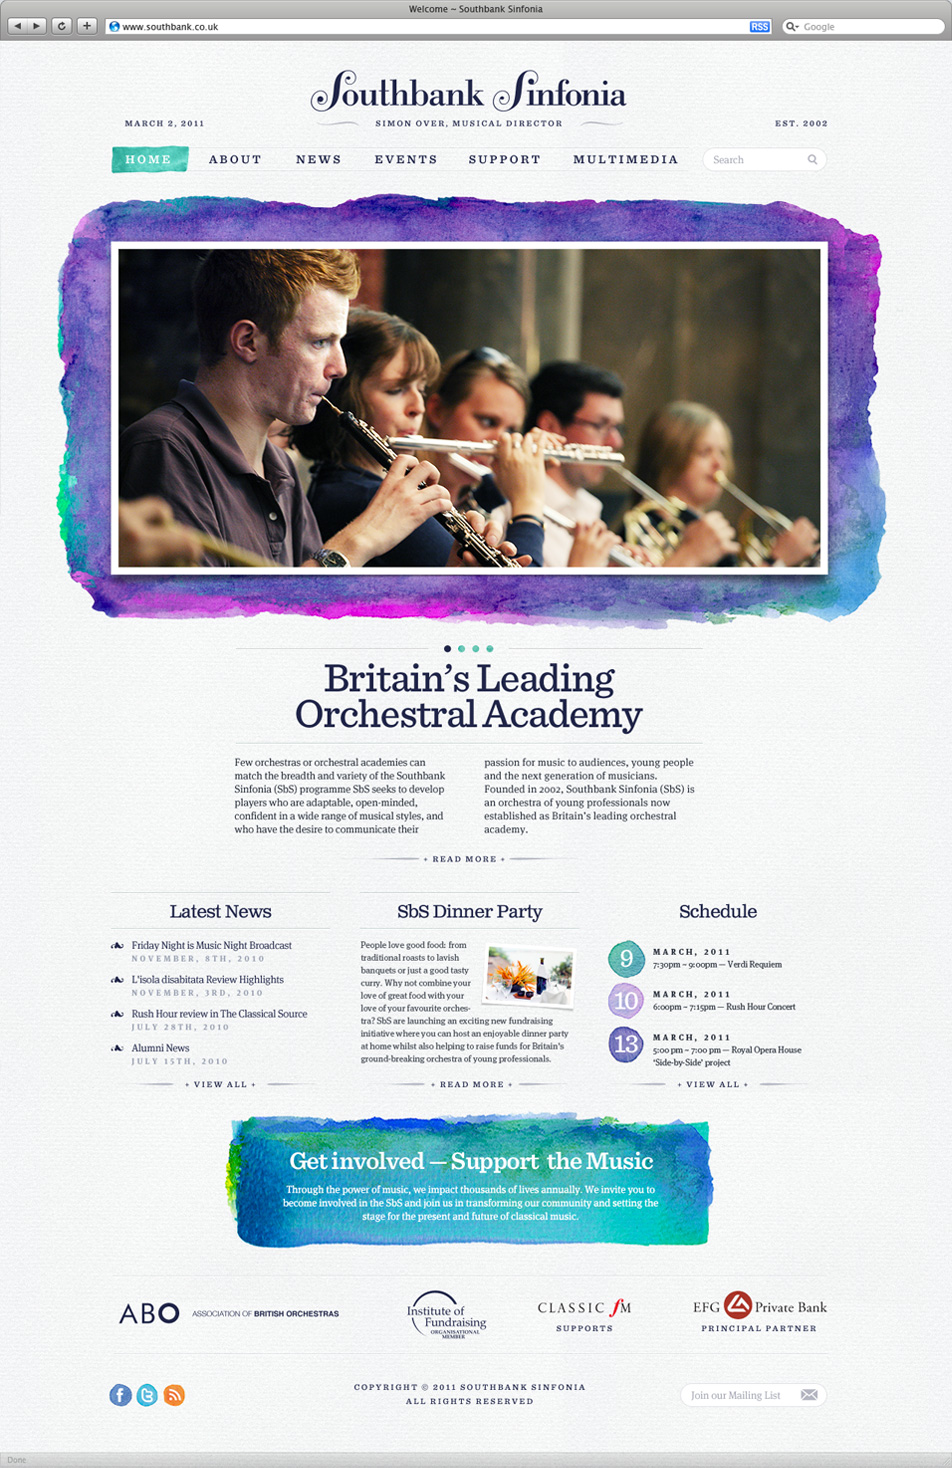 Southbank Sinfonia